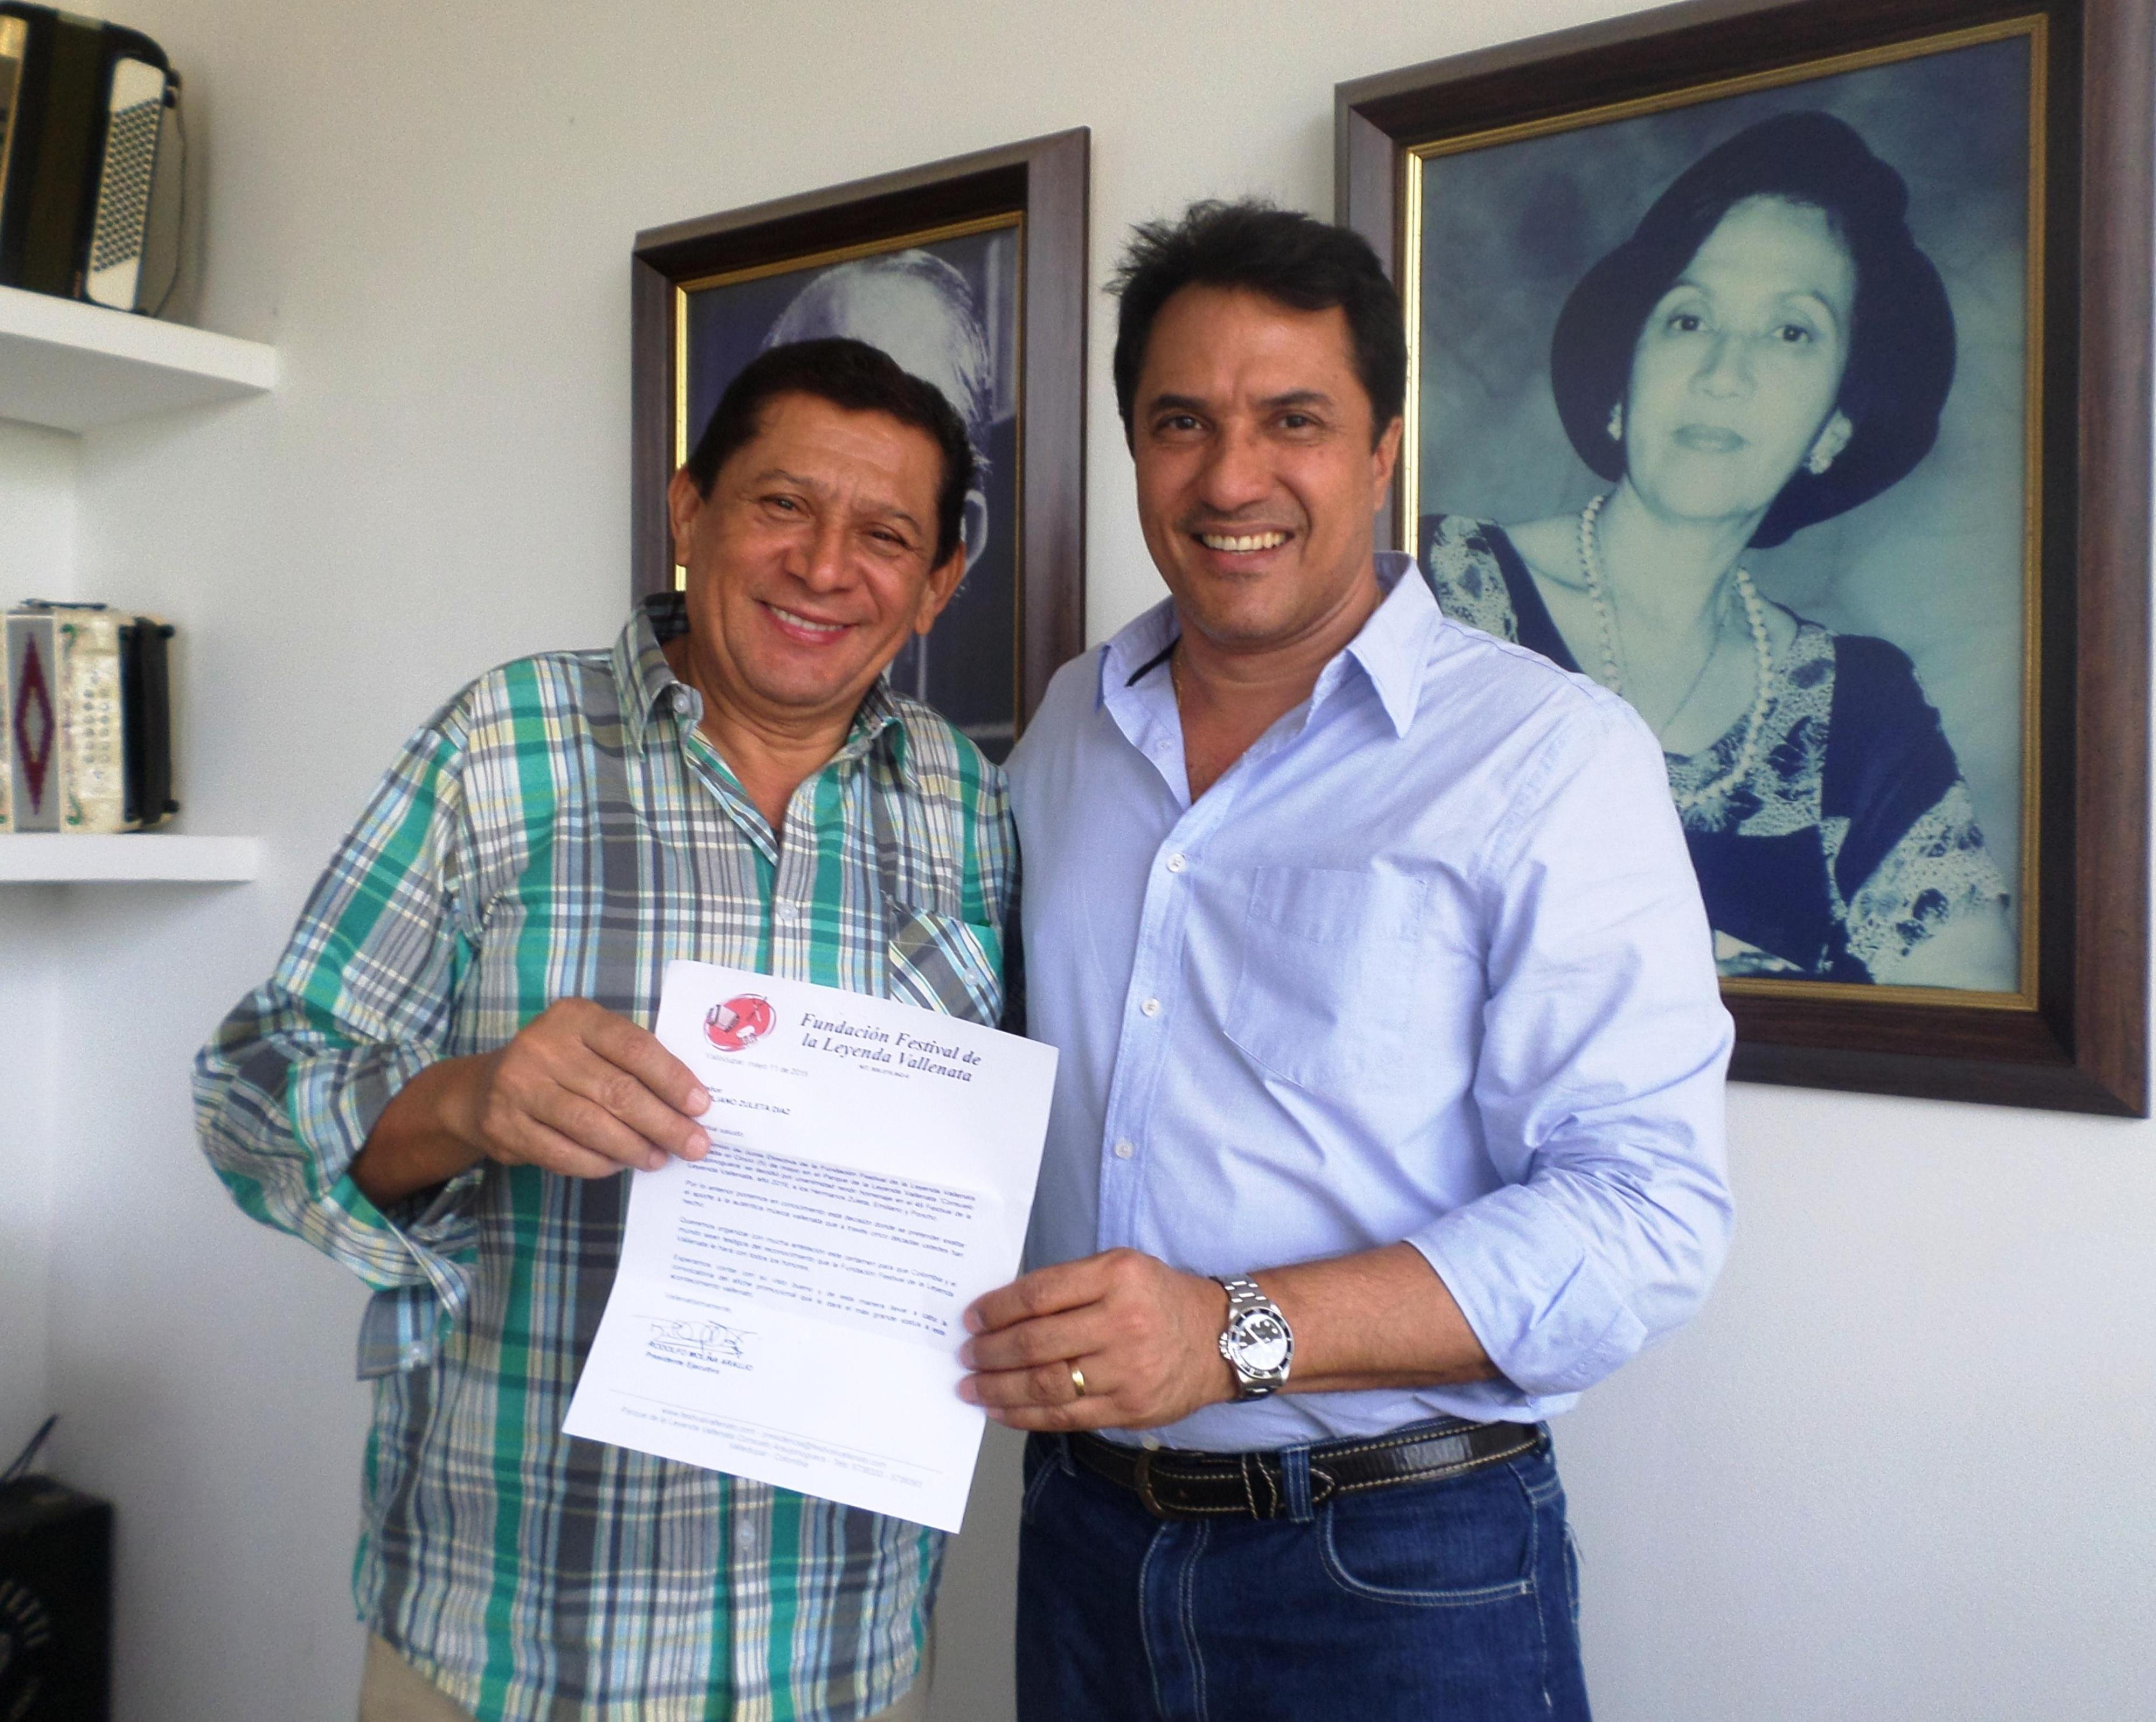 Emiliano Zuleta y Rodolfo Molina. Foto Cherlis Gamez Cuadros